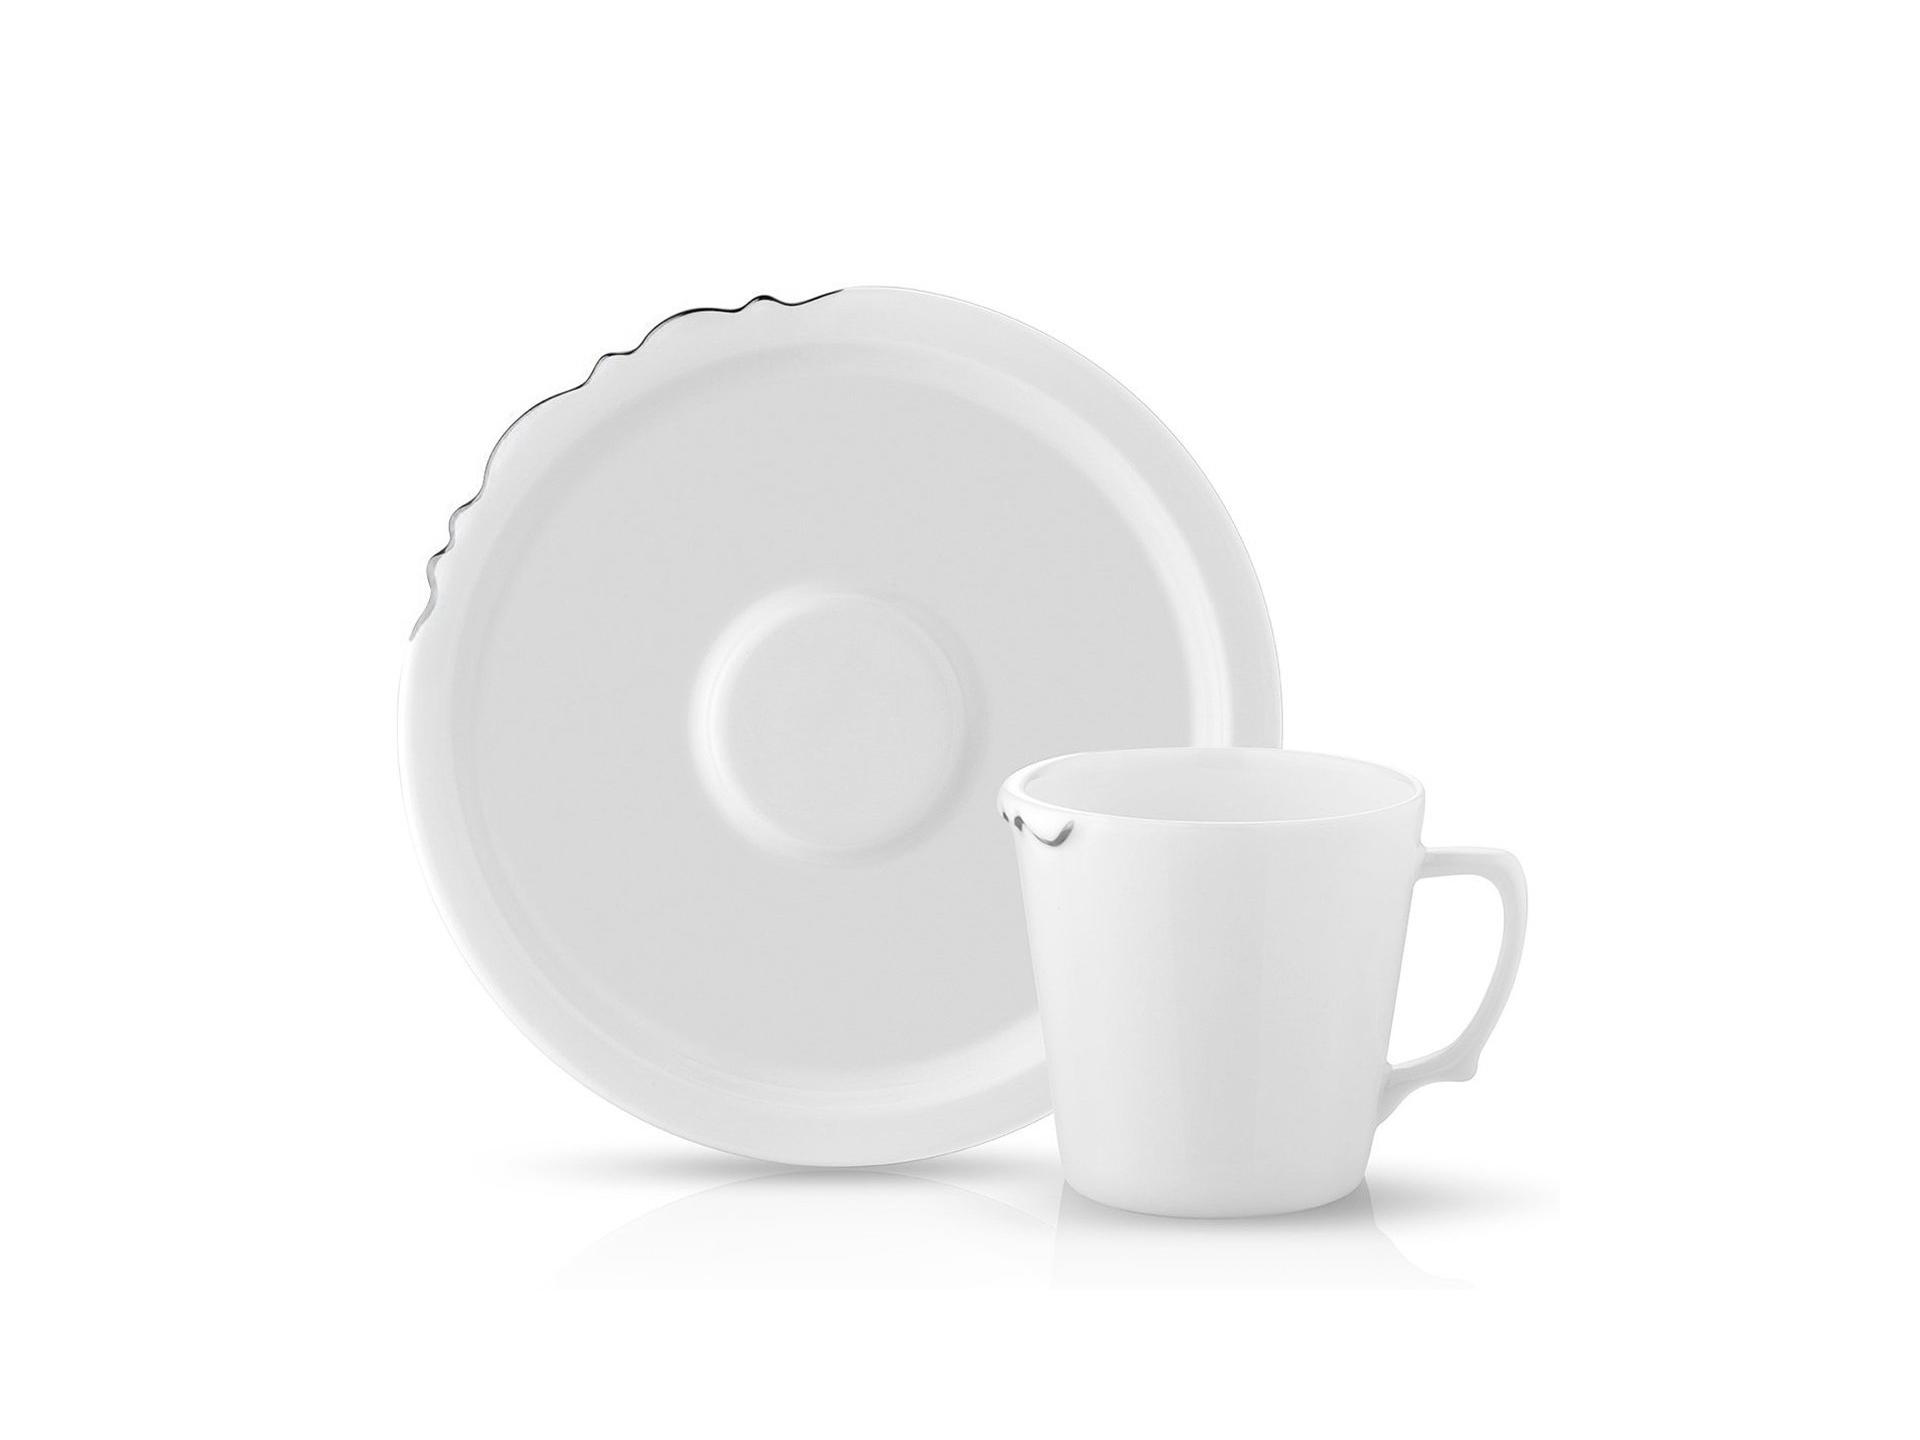 Eser-i İstanbul Çay/Kahve Fincanı